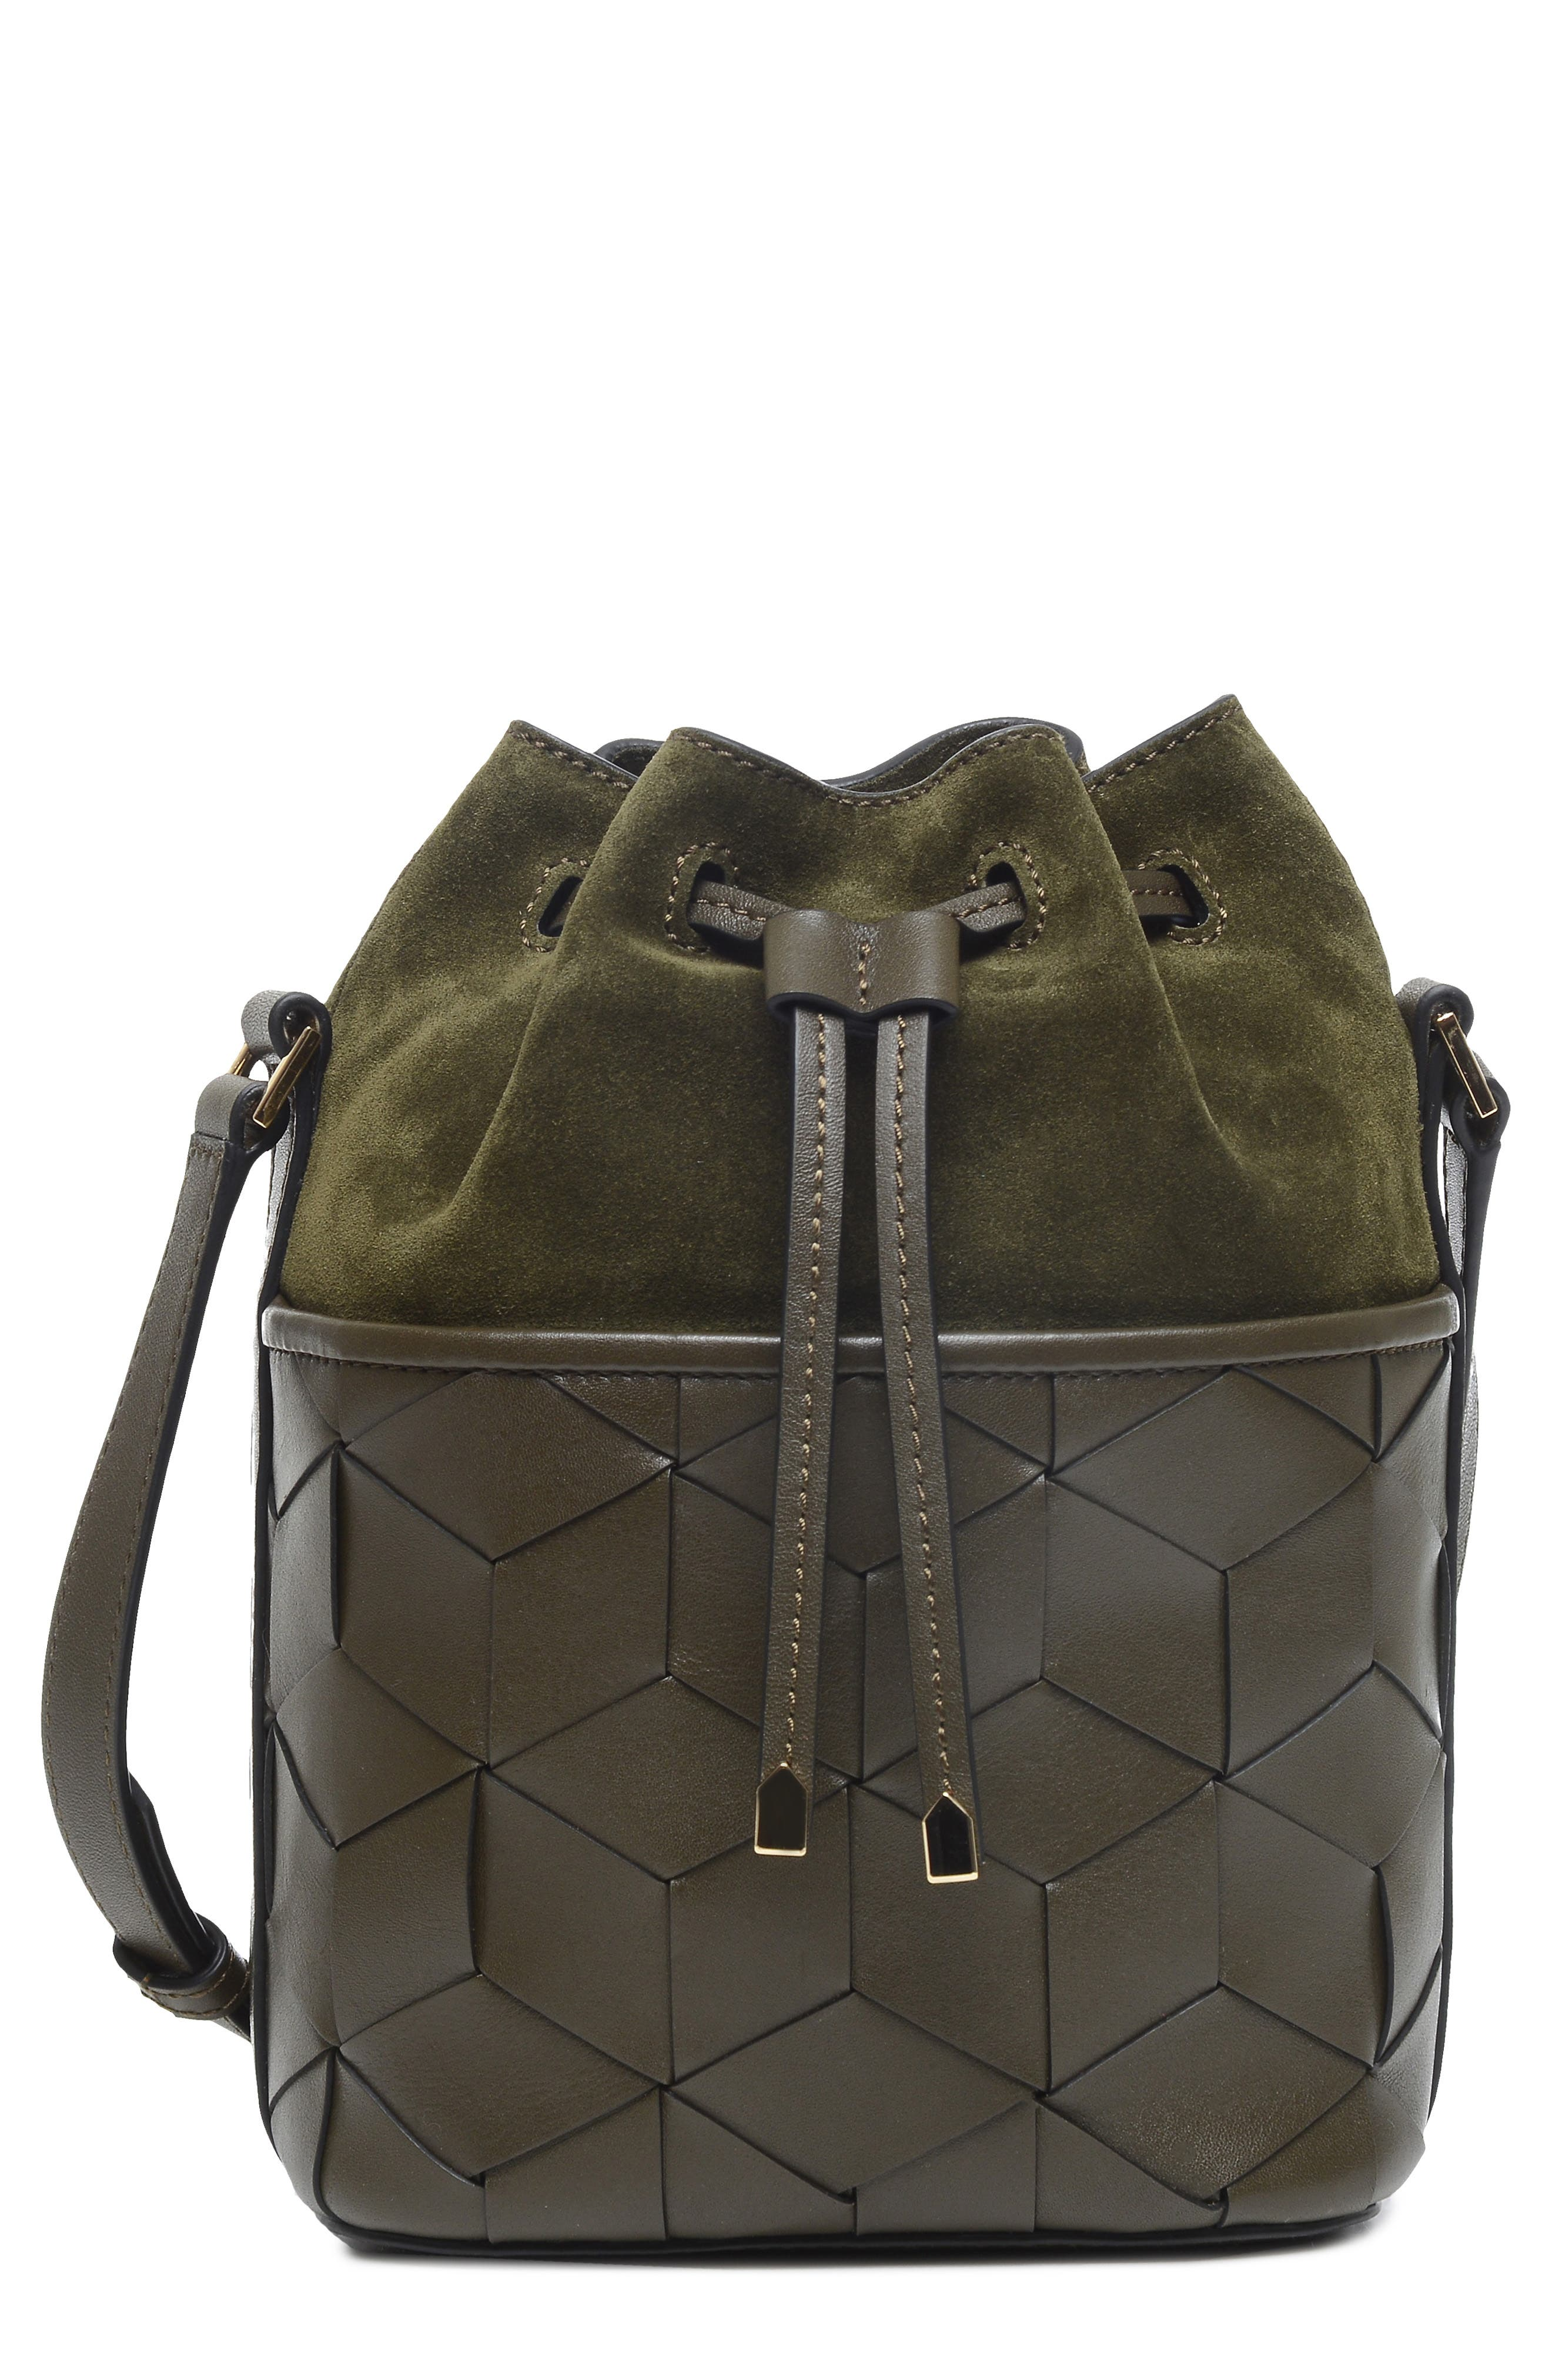 WELDEN Mini Gallivanter Leather Bucket Bag - Green in Dark Olive